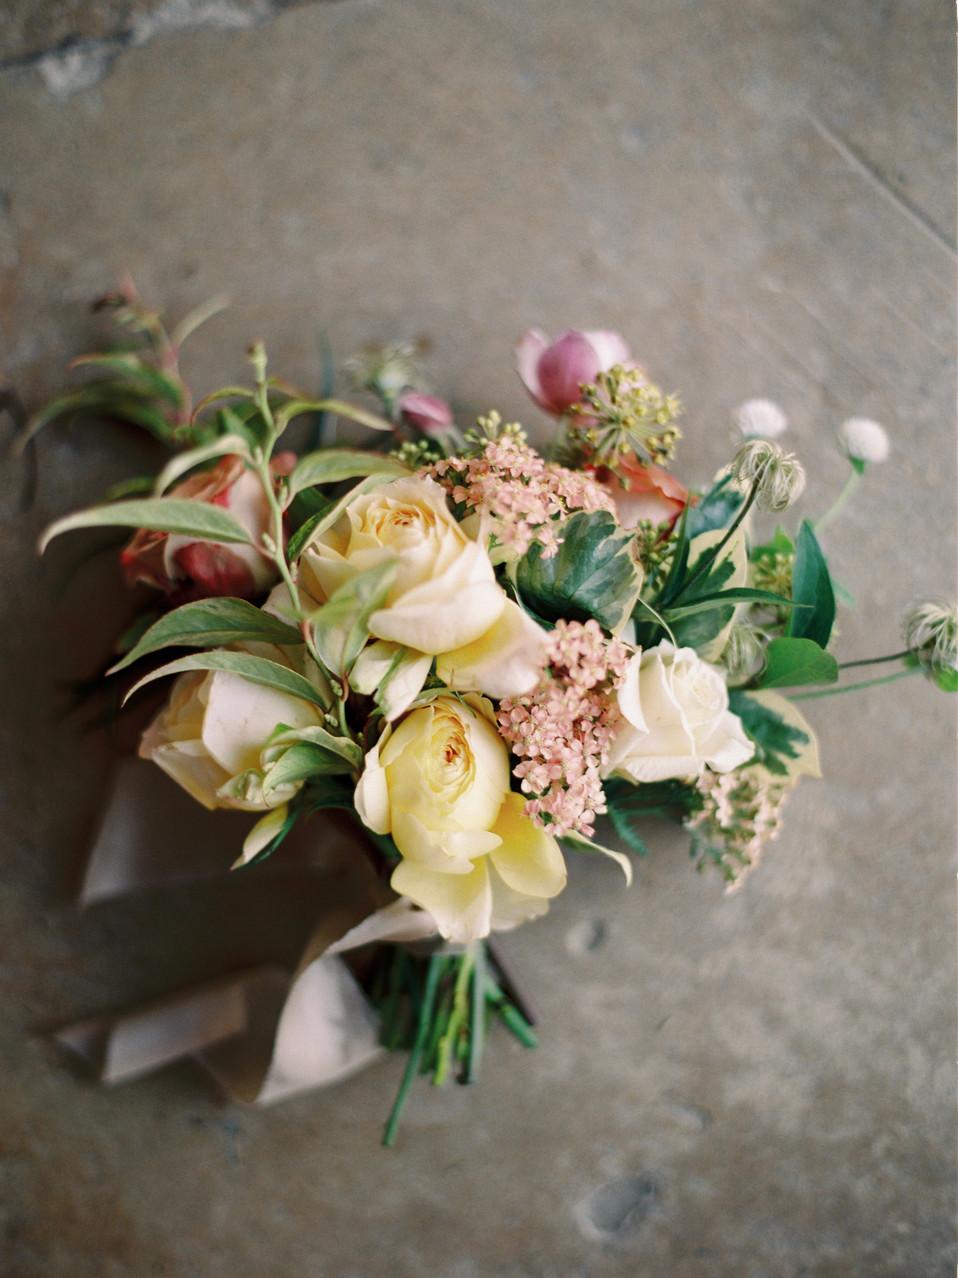 Sorores | Luxury Florist & Wedding Planner in London & The Cotswolds